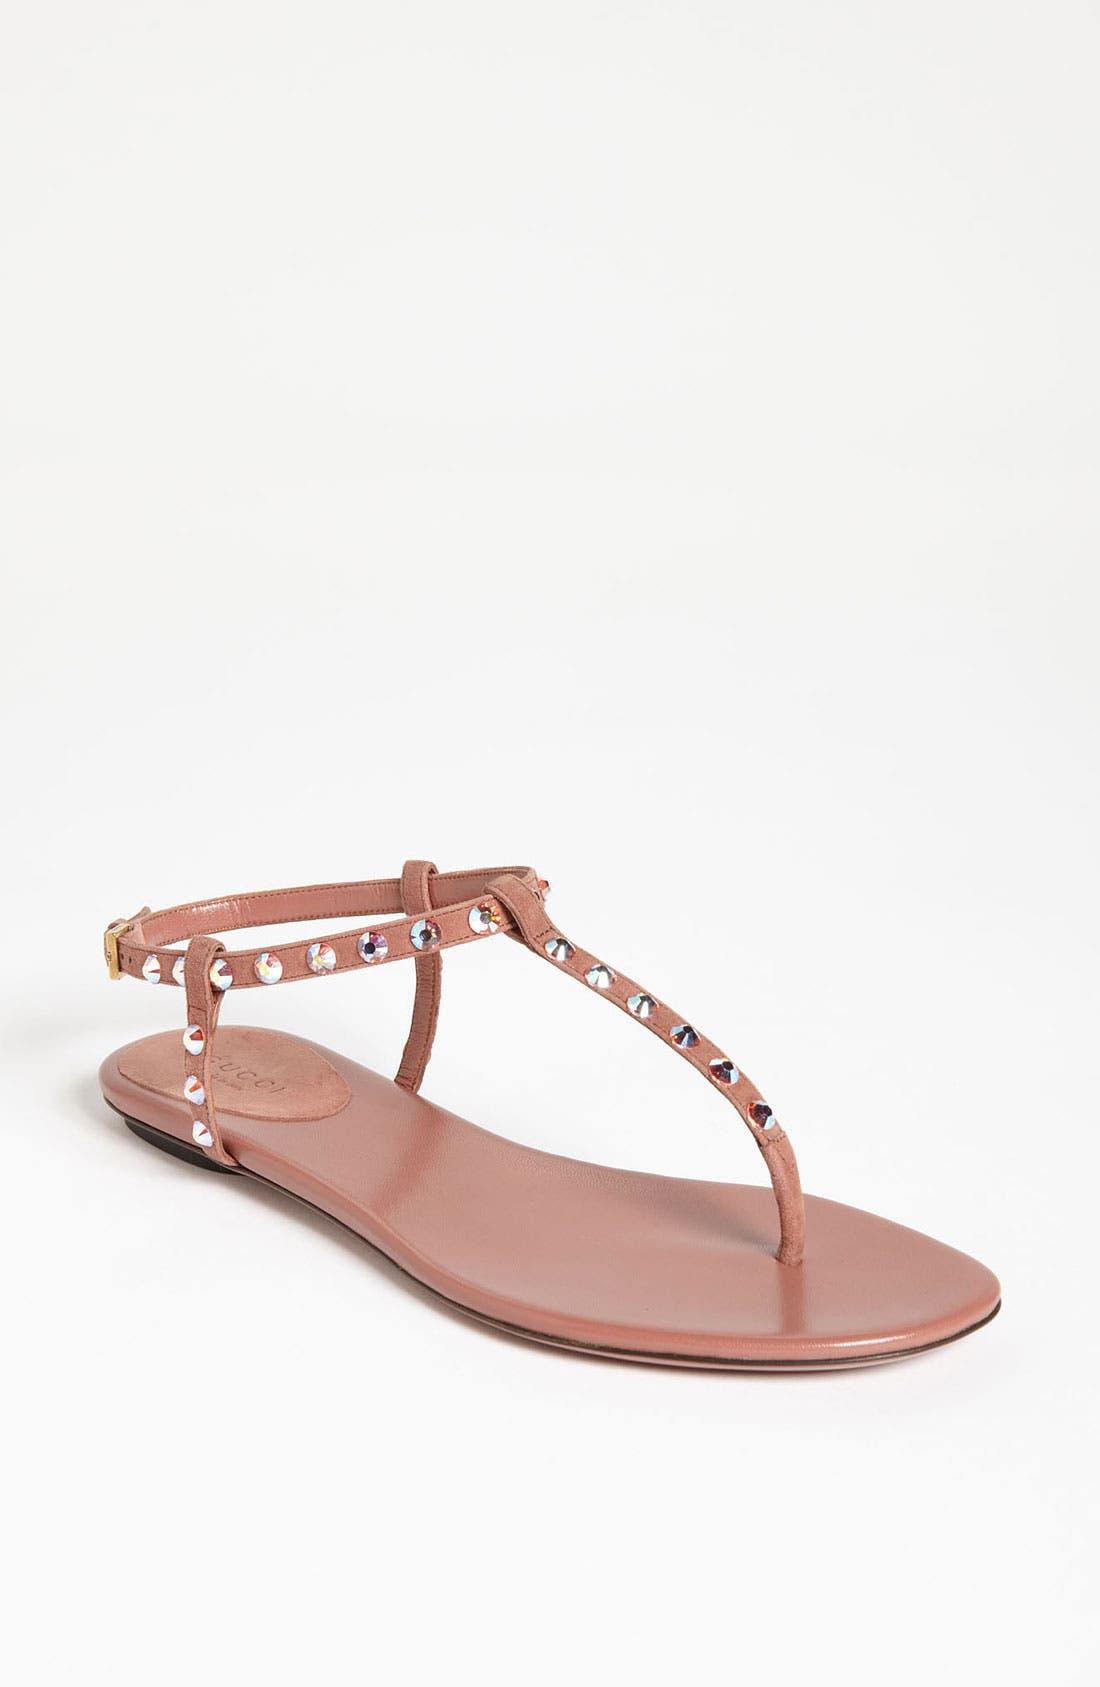 Main Image - Gucci 'Yulia' Sandal